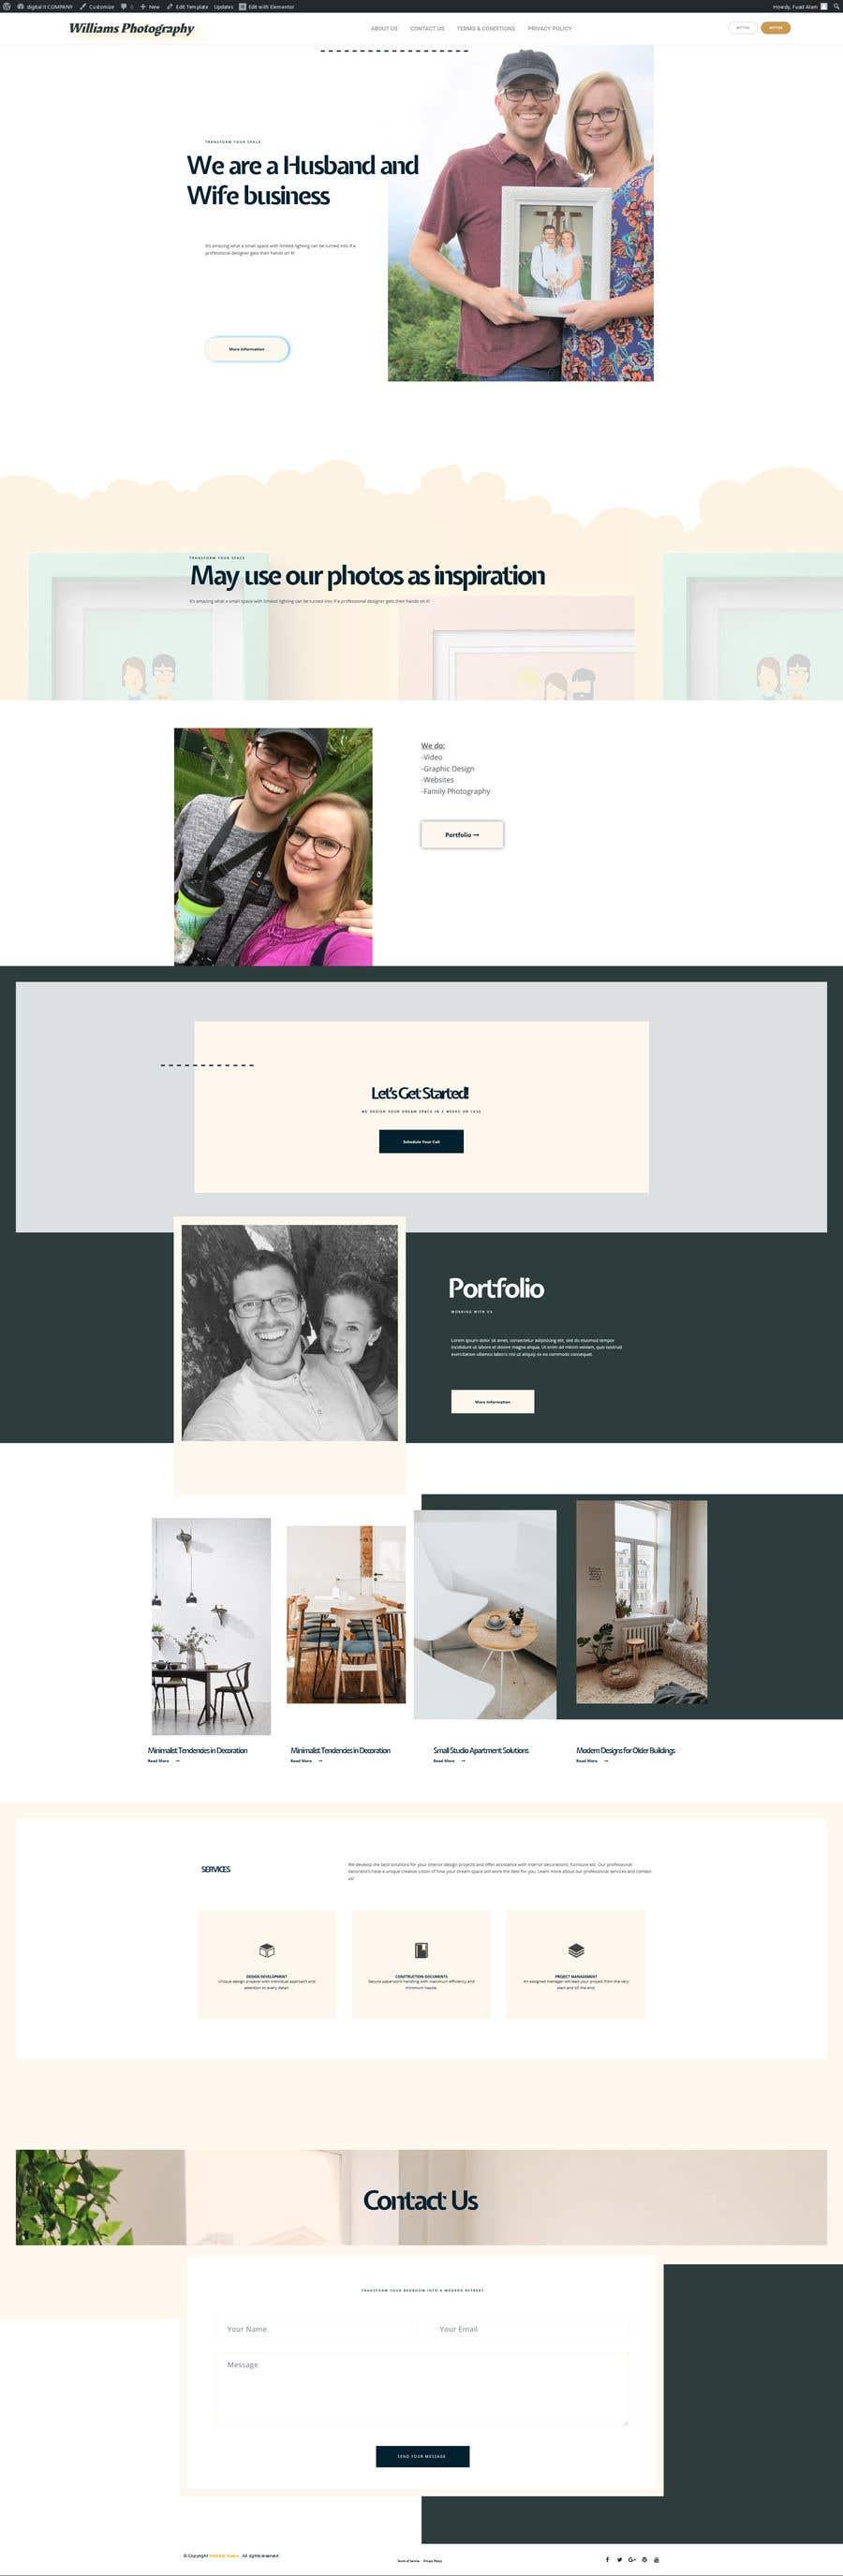 Kilpailutyö #44 kilpailussa Design Clean, Minimalist, Professional Website Layout and Logo